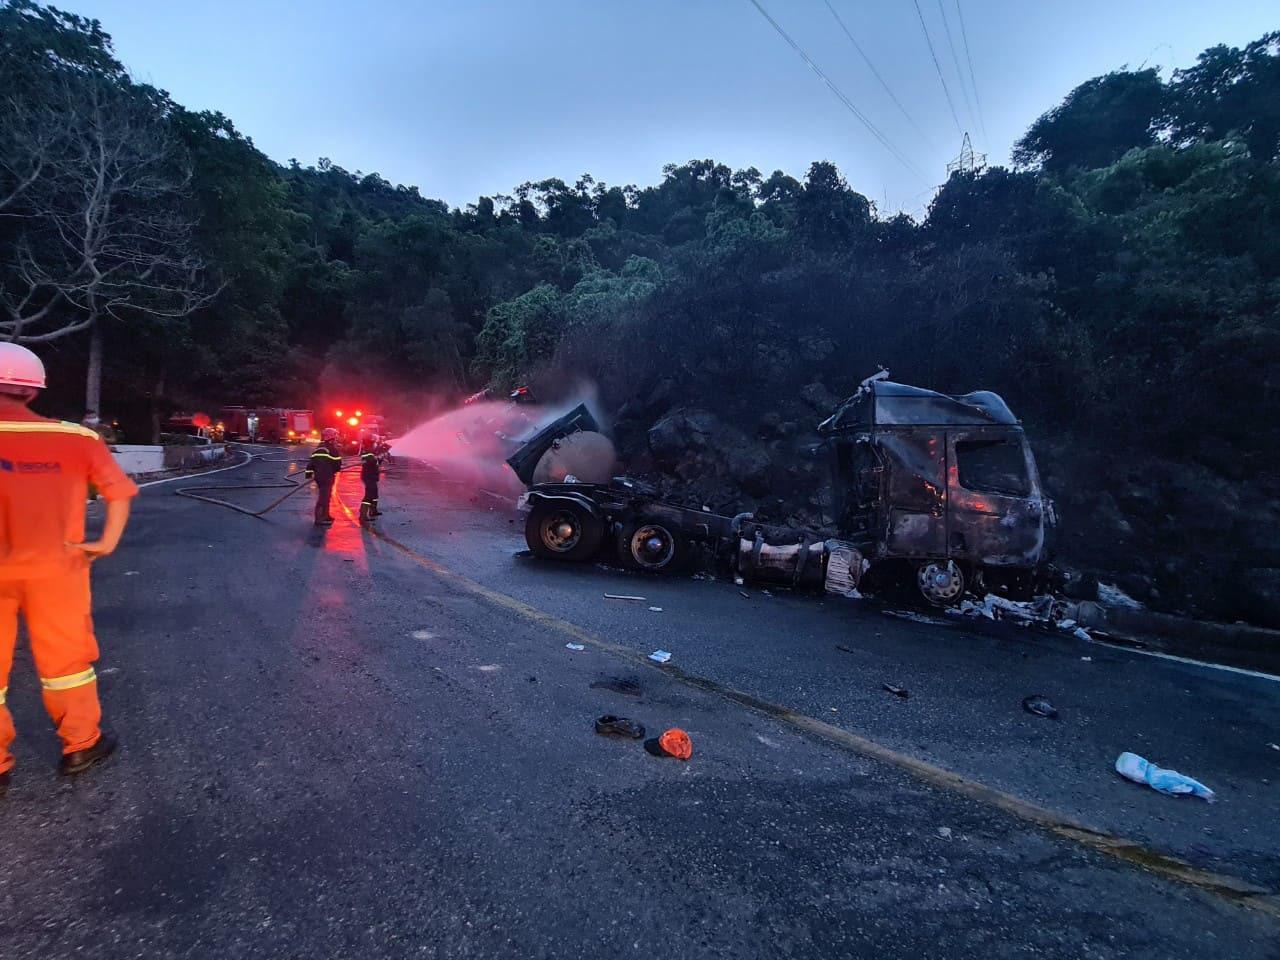 Fuel truck overturns, bursts into flames on Hai Van Pass in central Vietnam